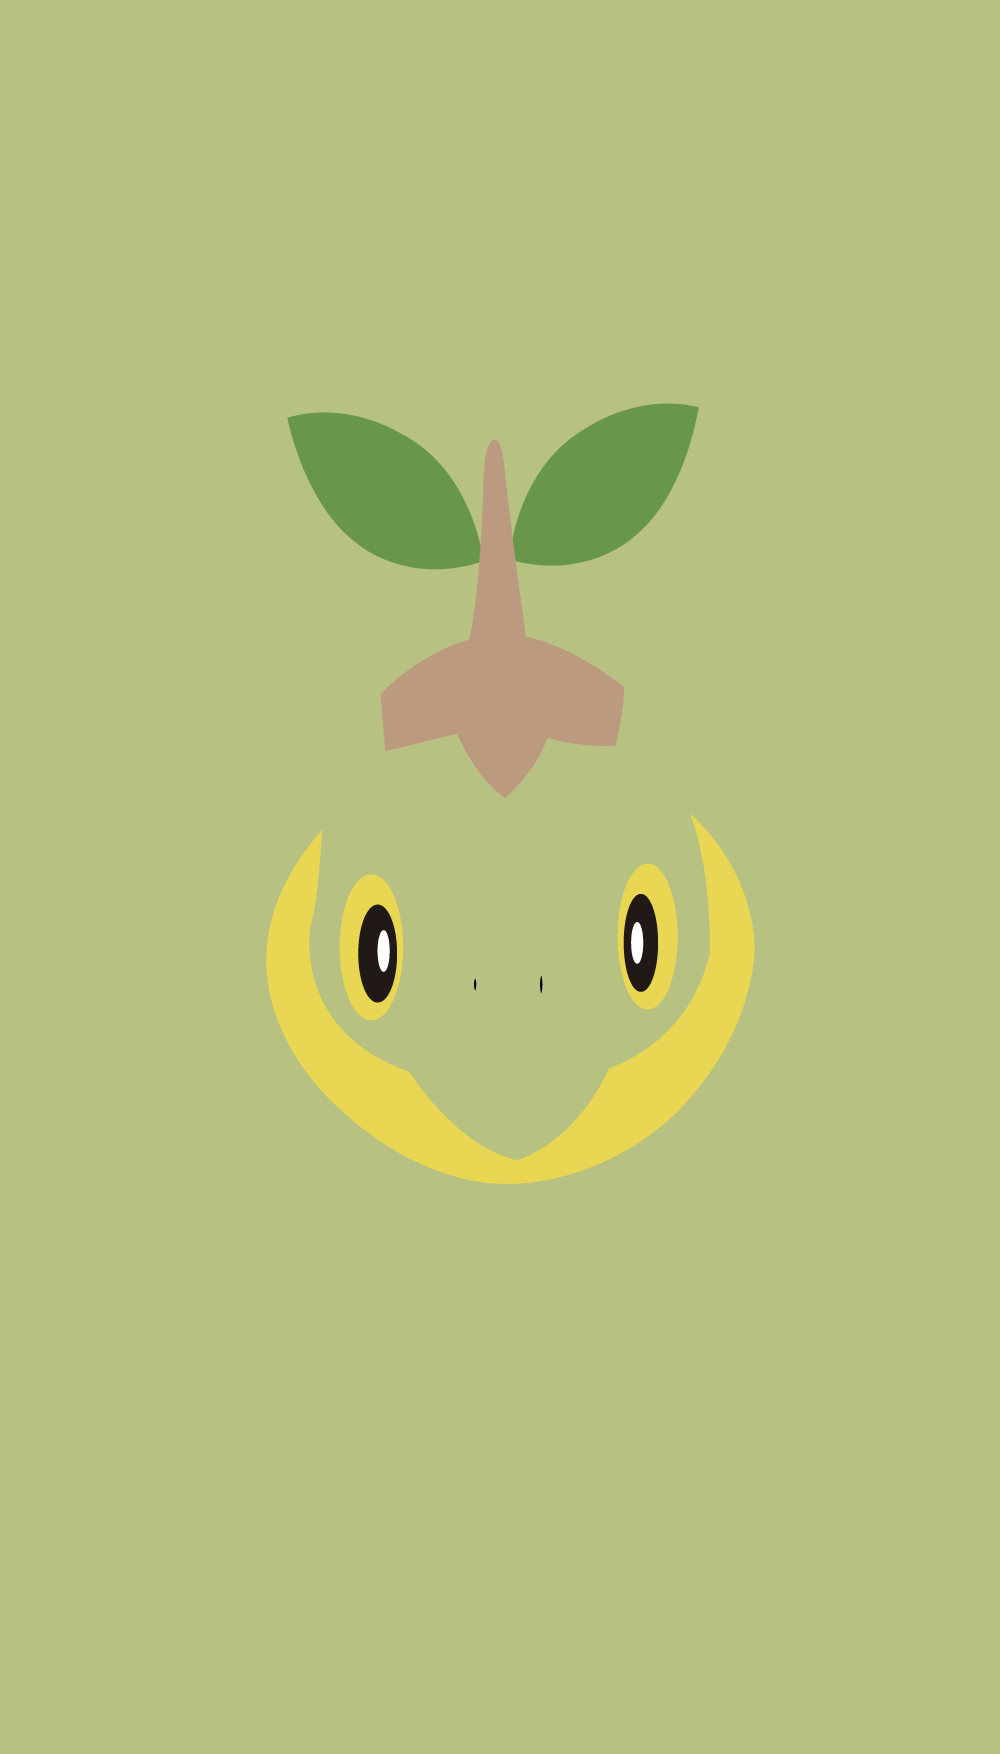 Pokemon Wallpaper Turtwig | Jackson's Room | Pinterest | Pokémon …